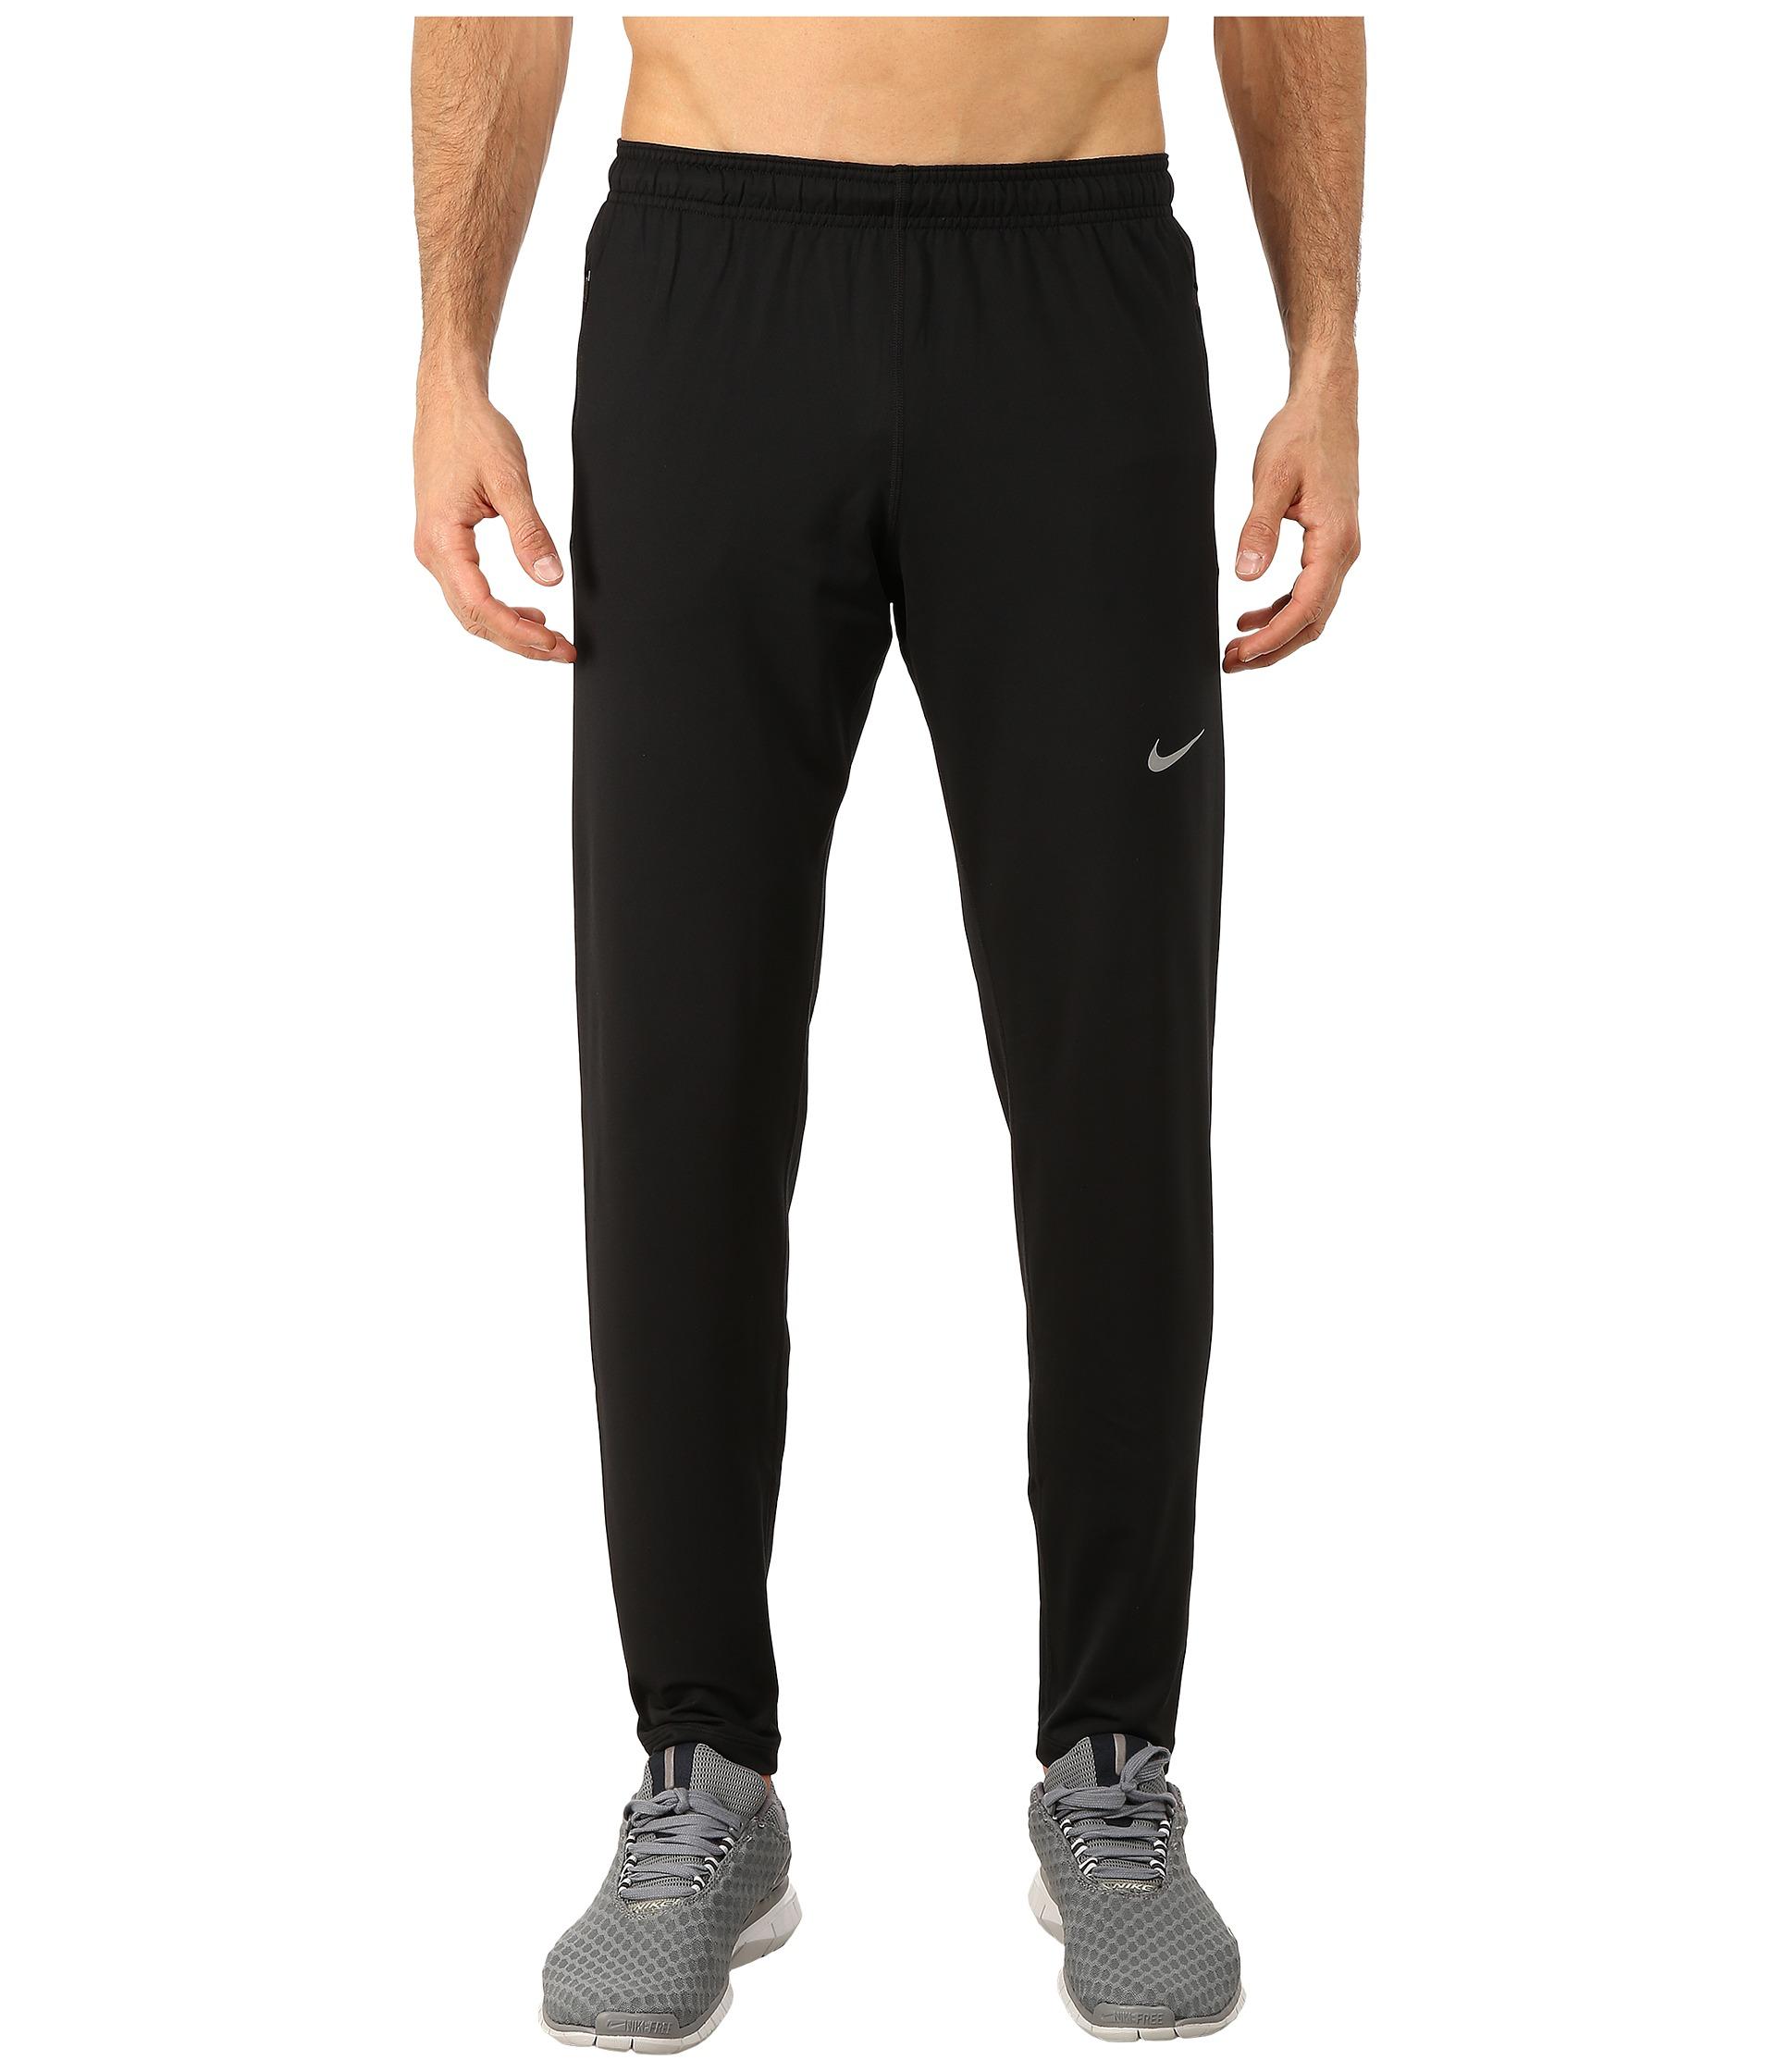 Nike OTC65 Track Running Pant at Zappos.com